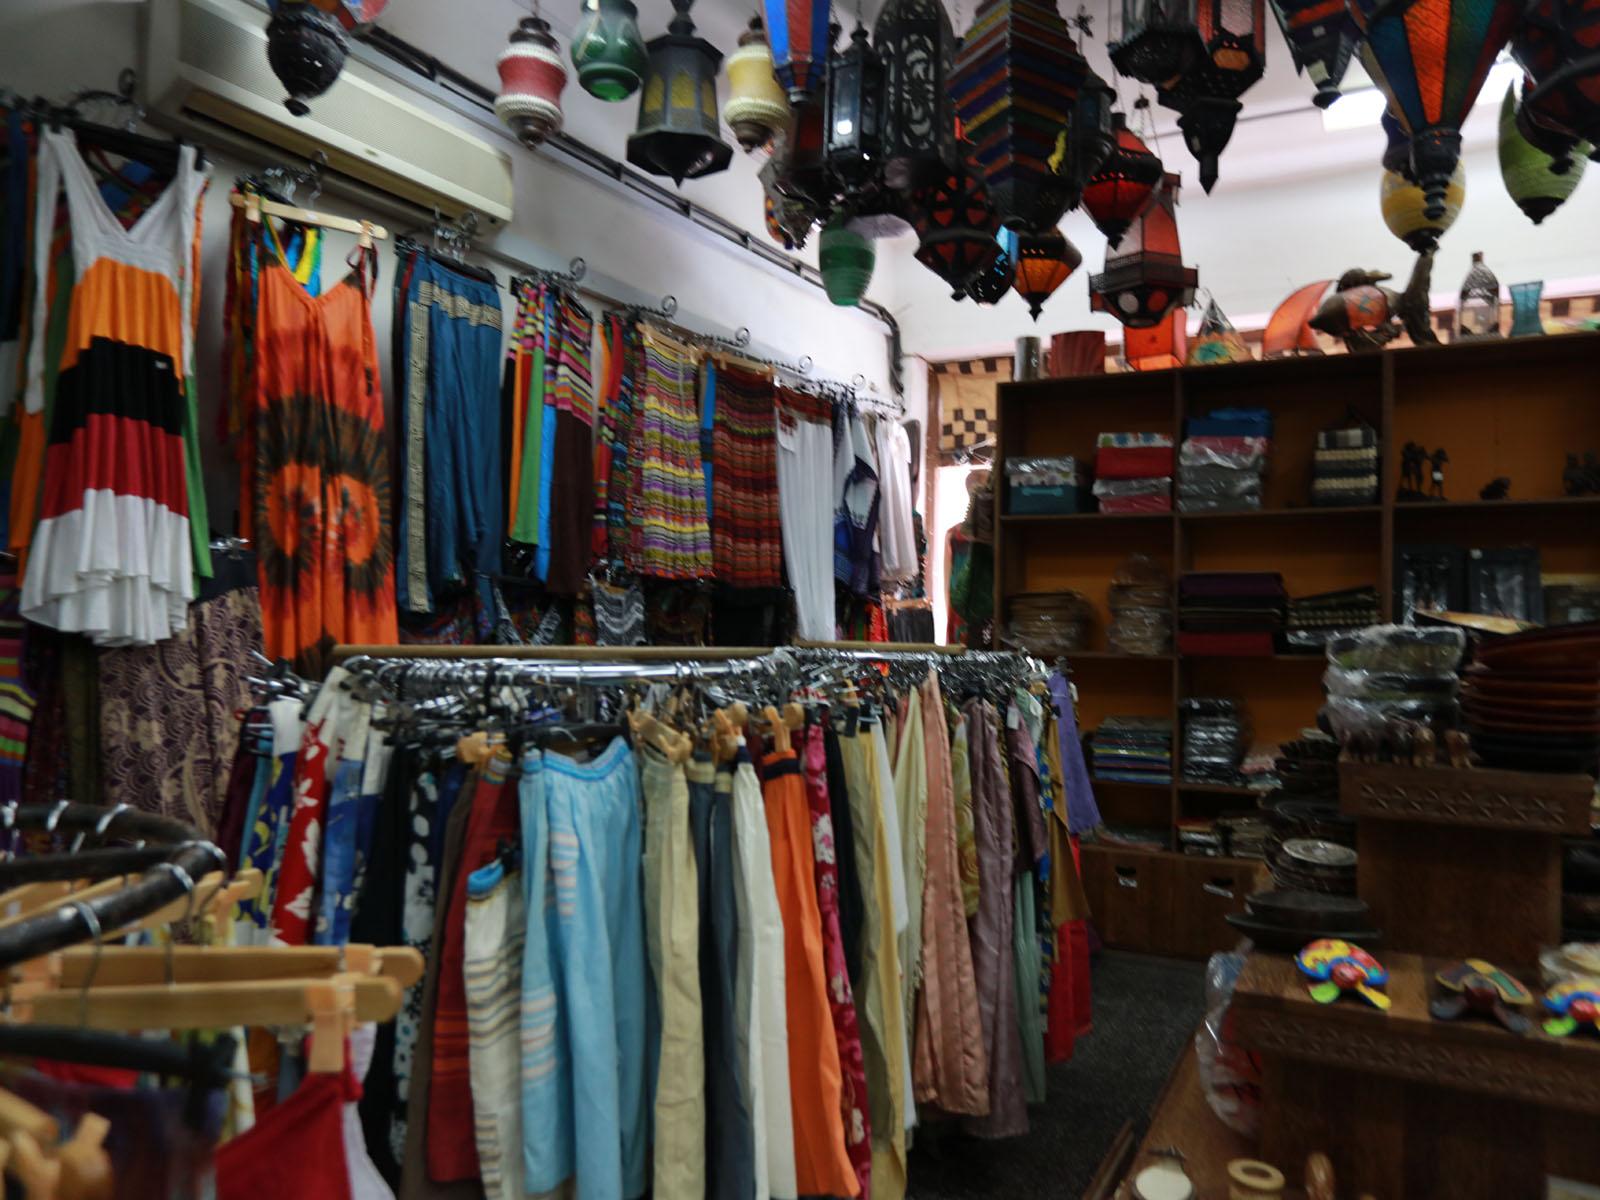 Gallery Tours & Safari - Shopping